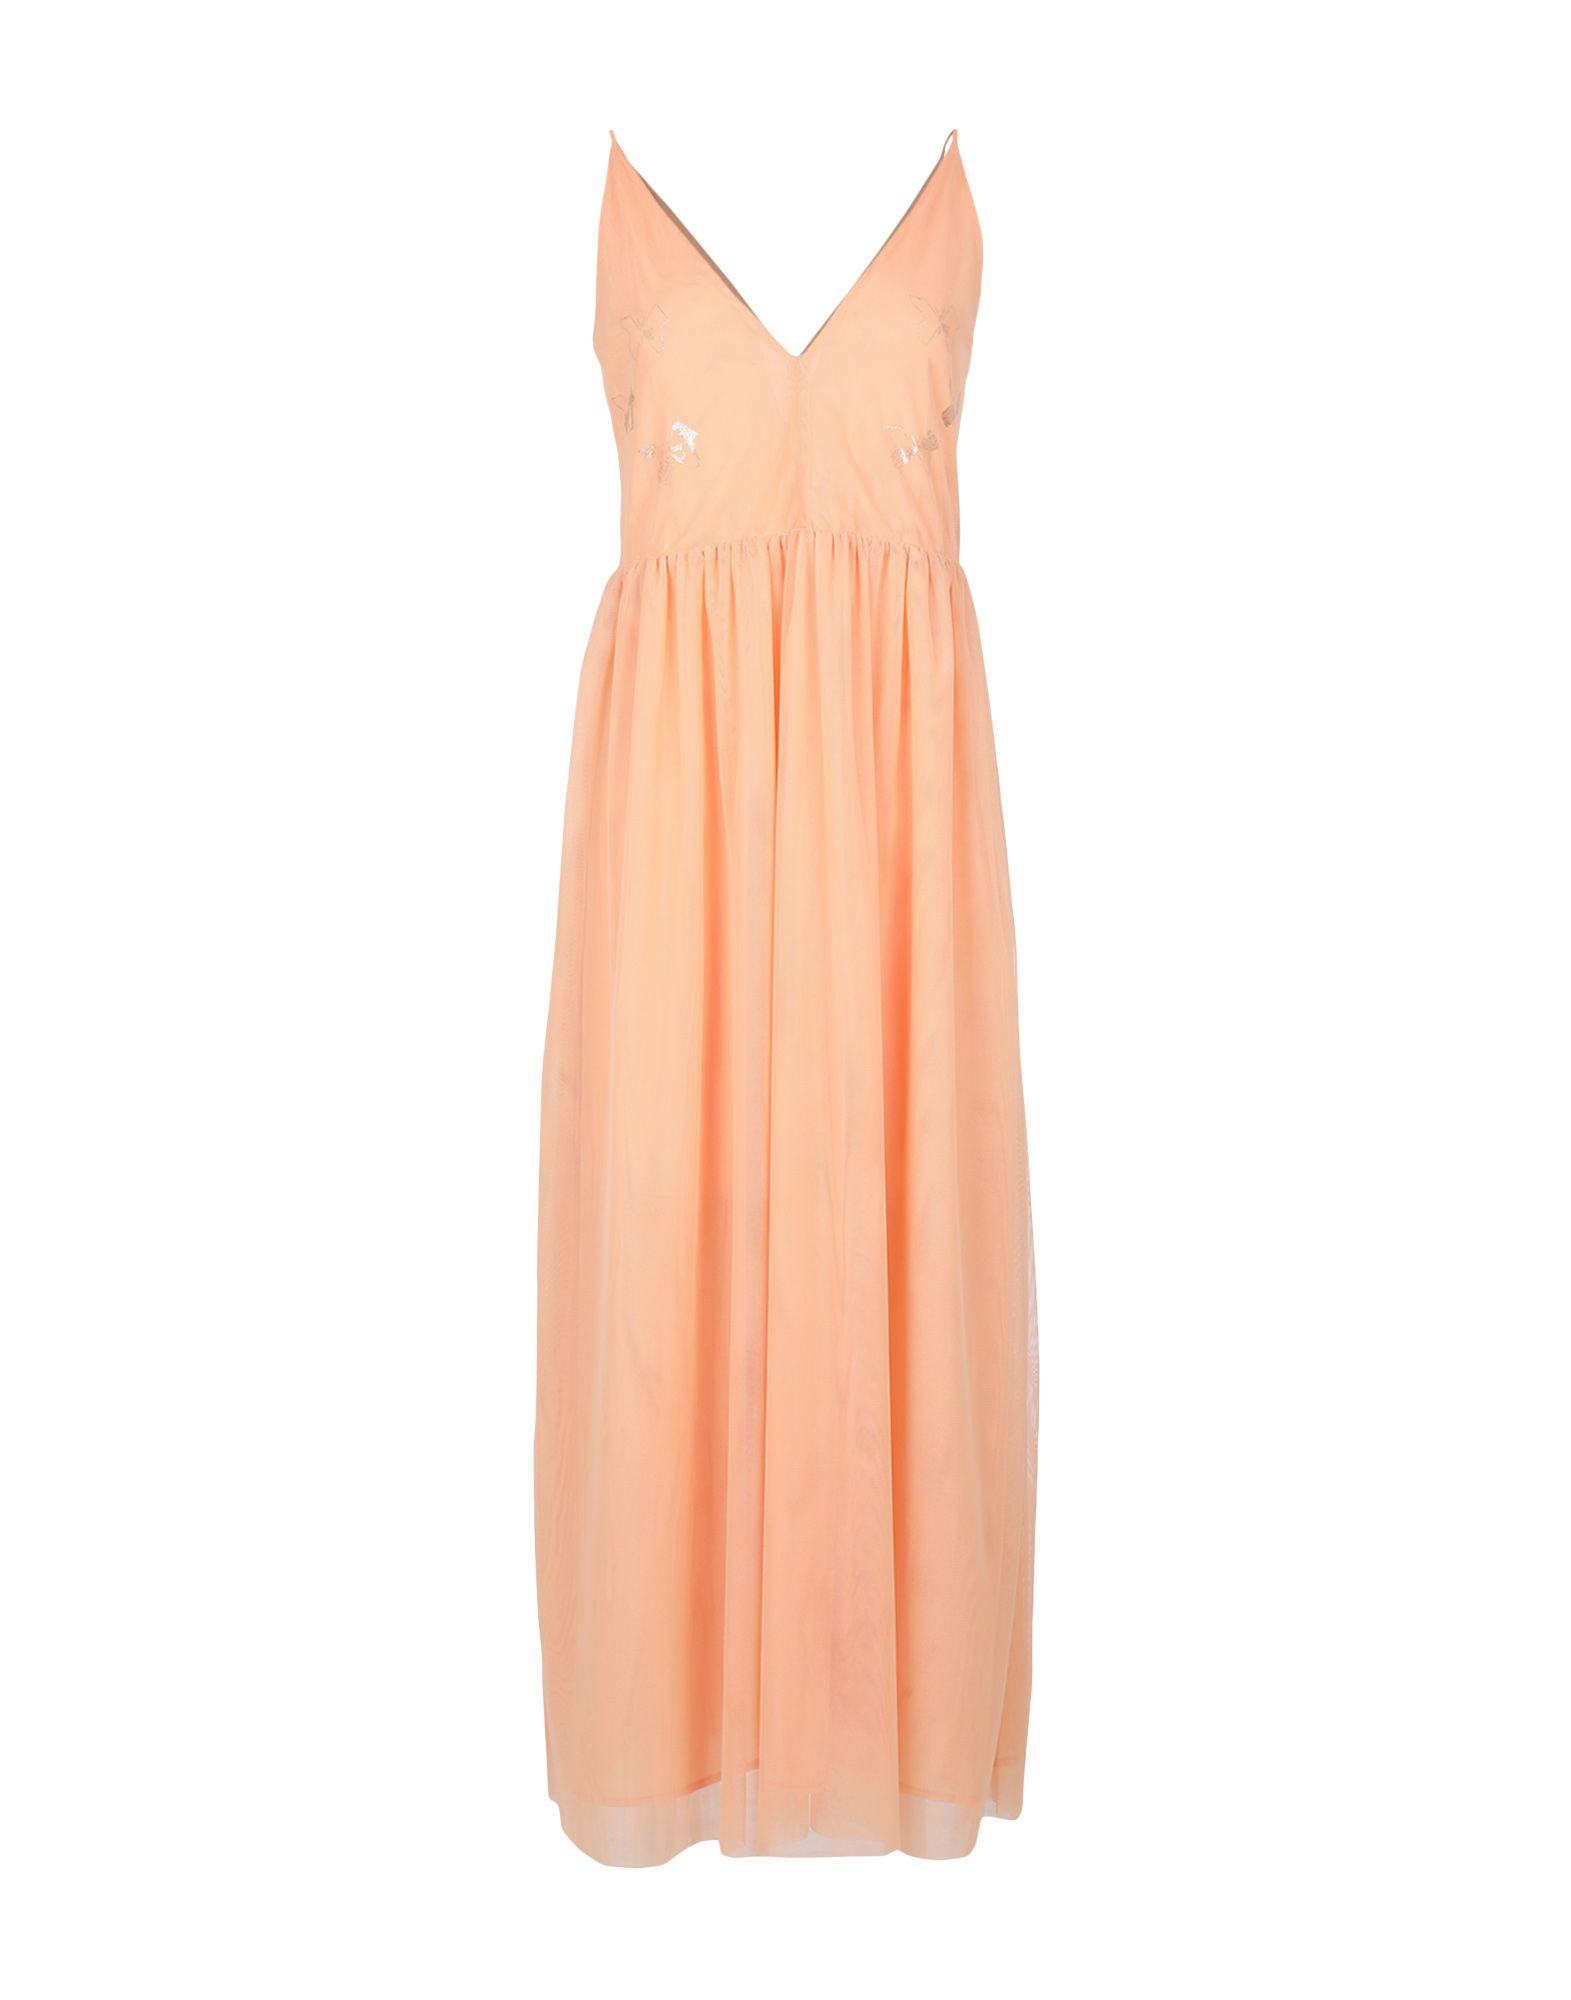 ATOS ATOS LOMBARDINI Платье длиной 3/4 atos atos lombardini юбка длиной 3 4